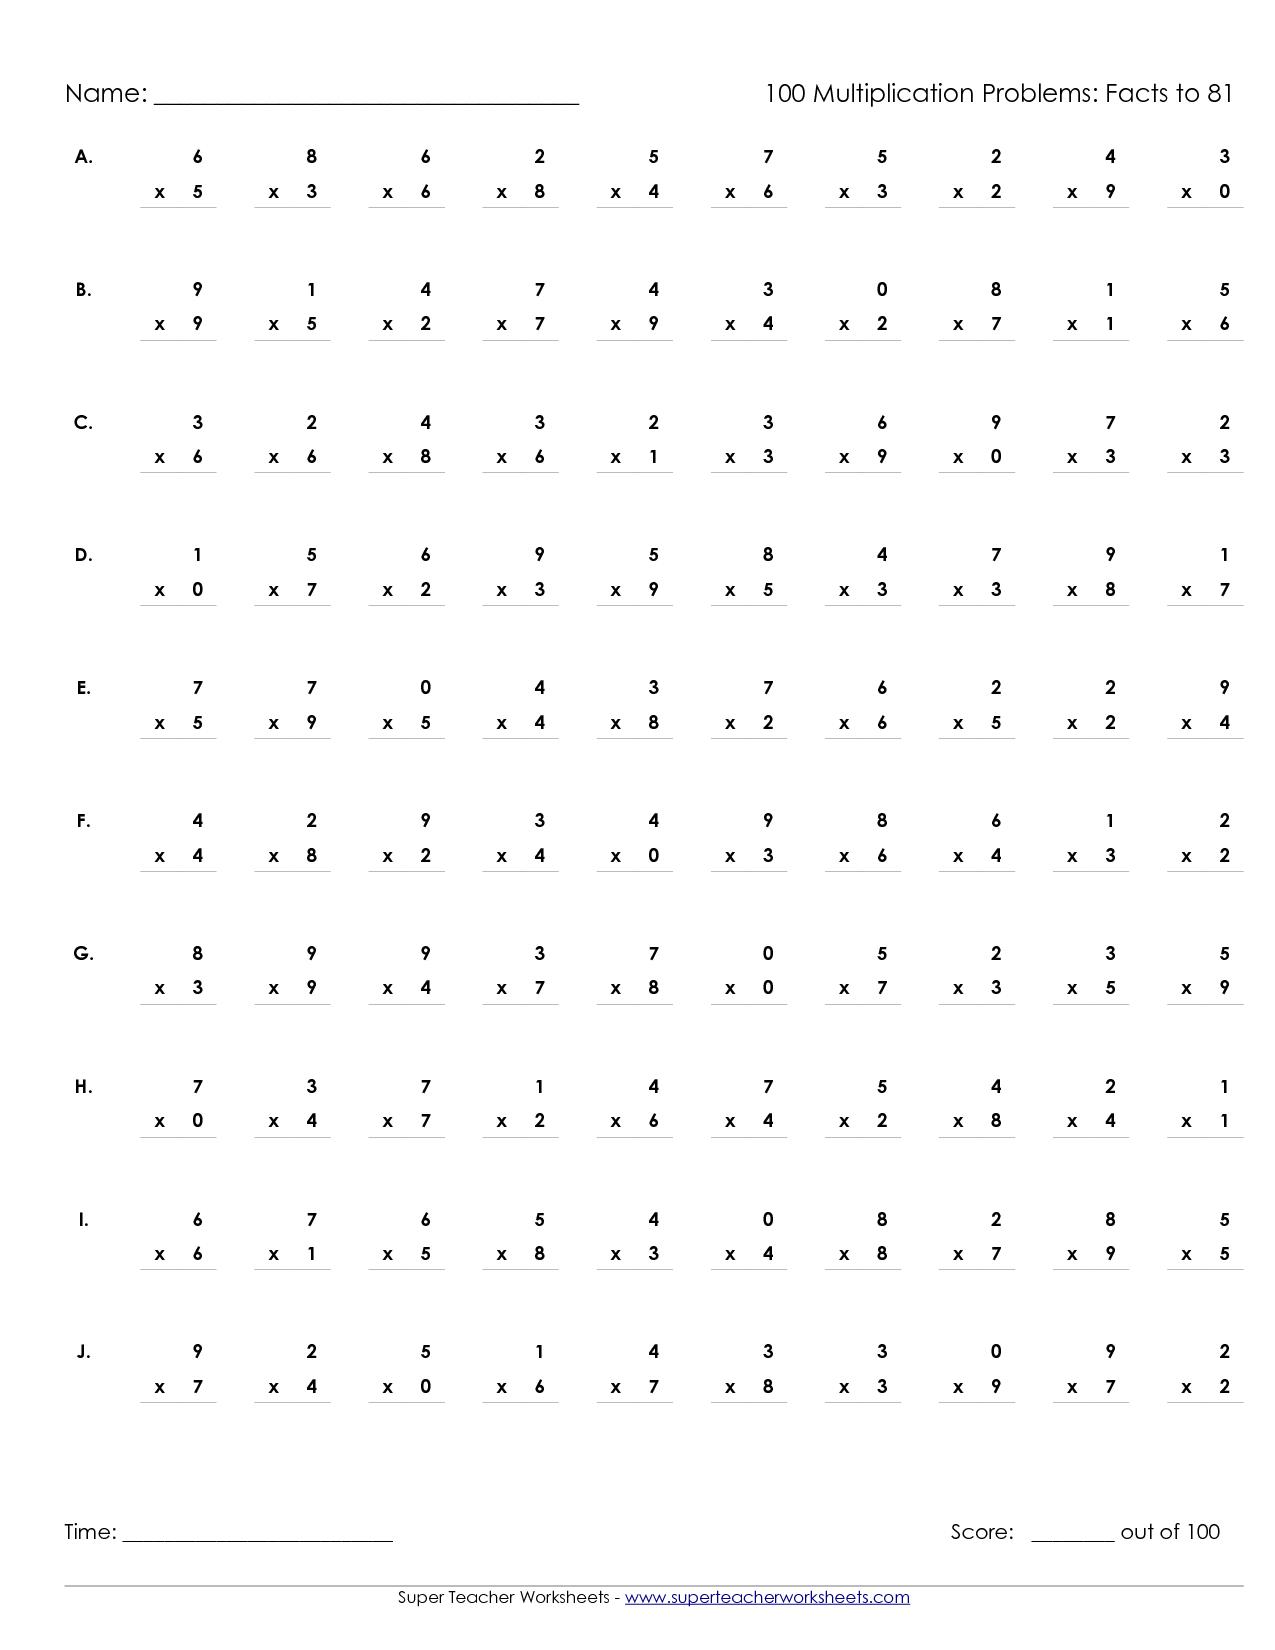 Printable Multiplication Worksheets 100 Problems   Math' S - Free Printable Multiplication Speed Drills